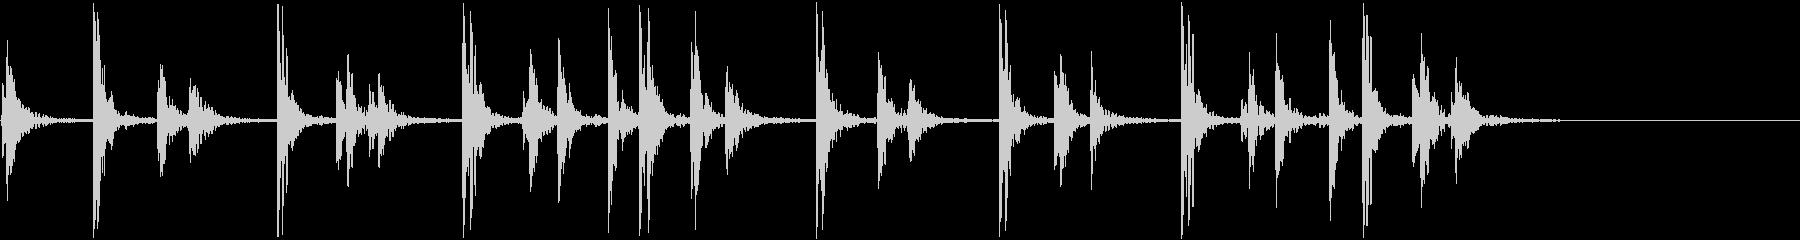 LOW TOM:VAMPY RHY...の未再生の波形